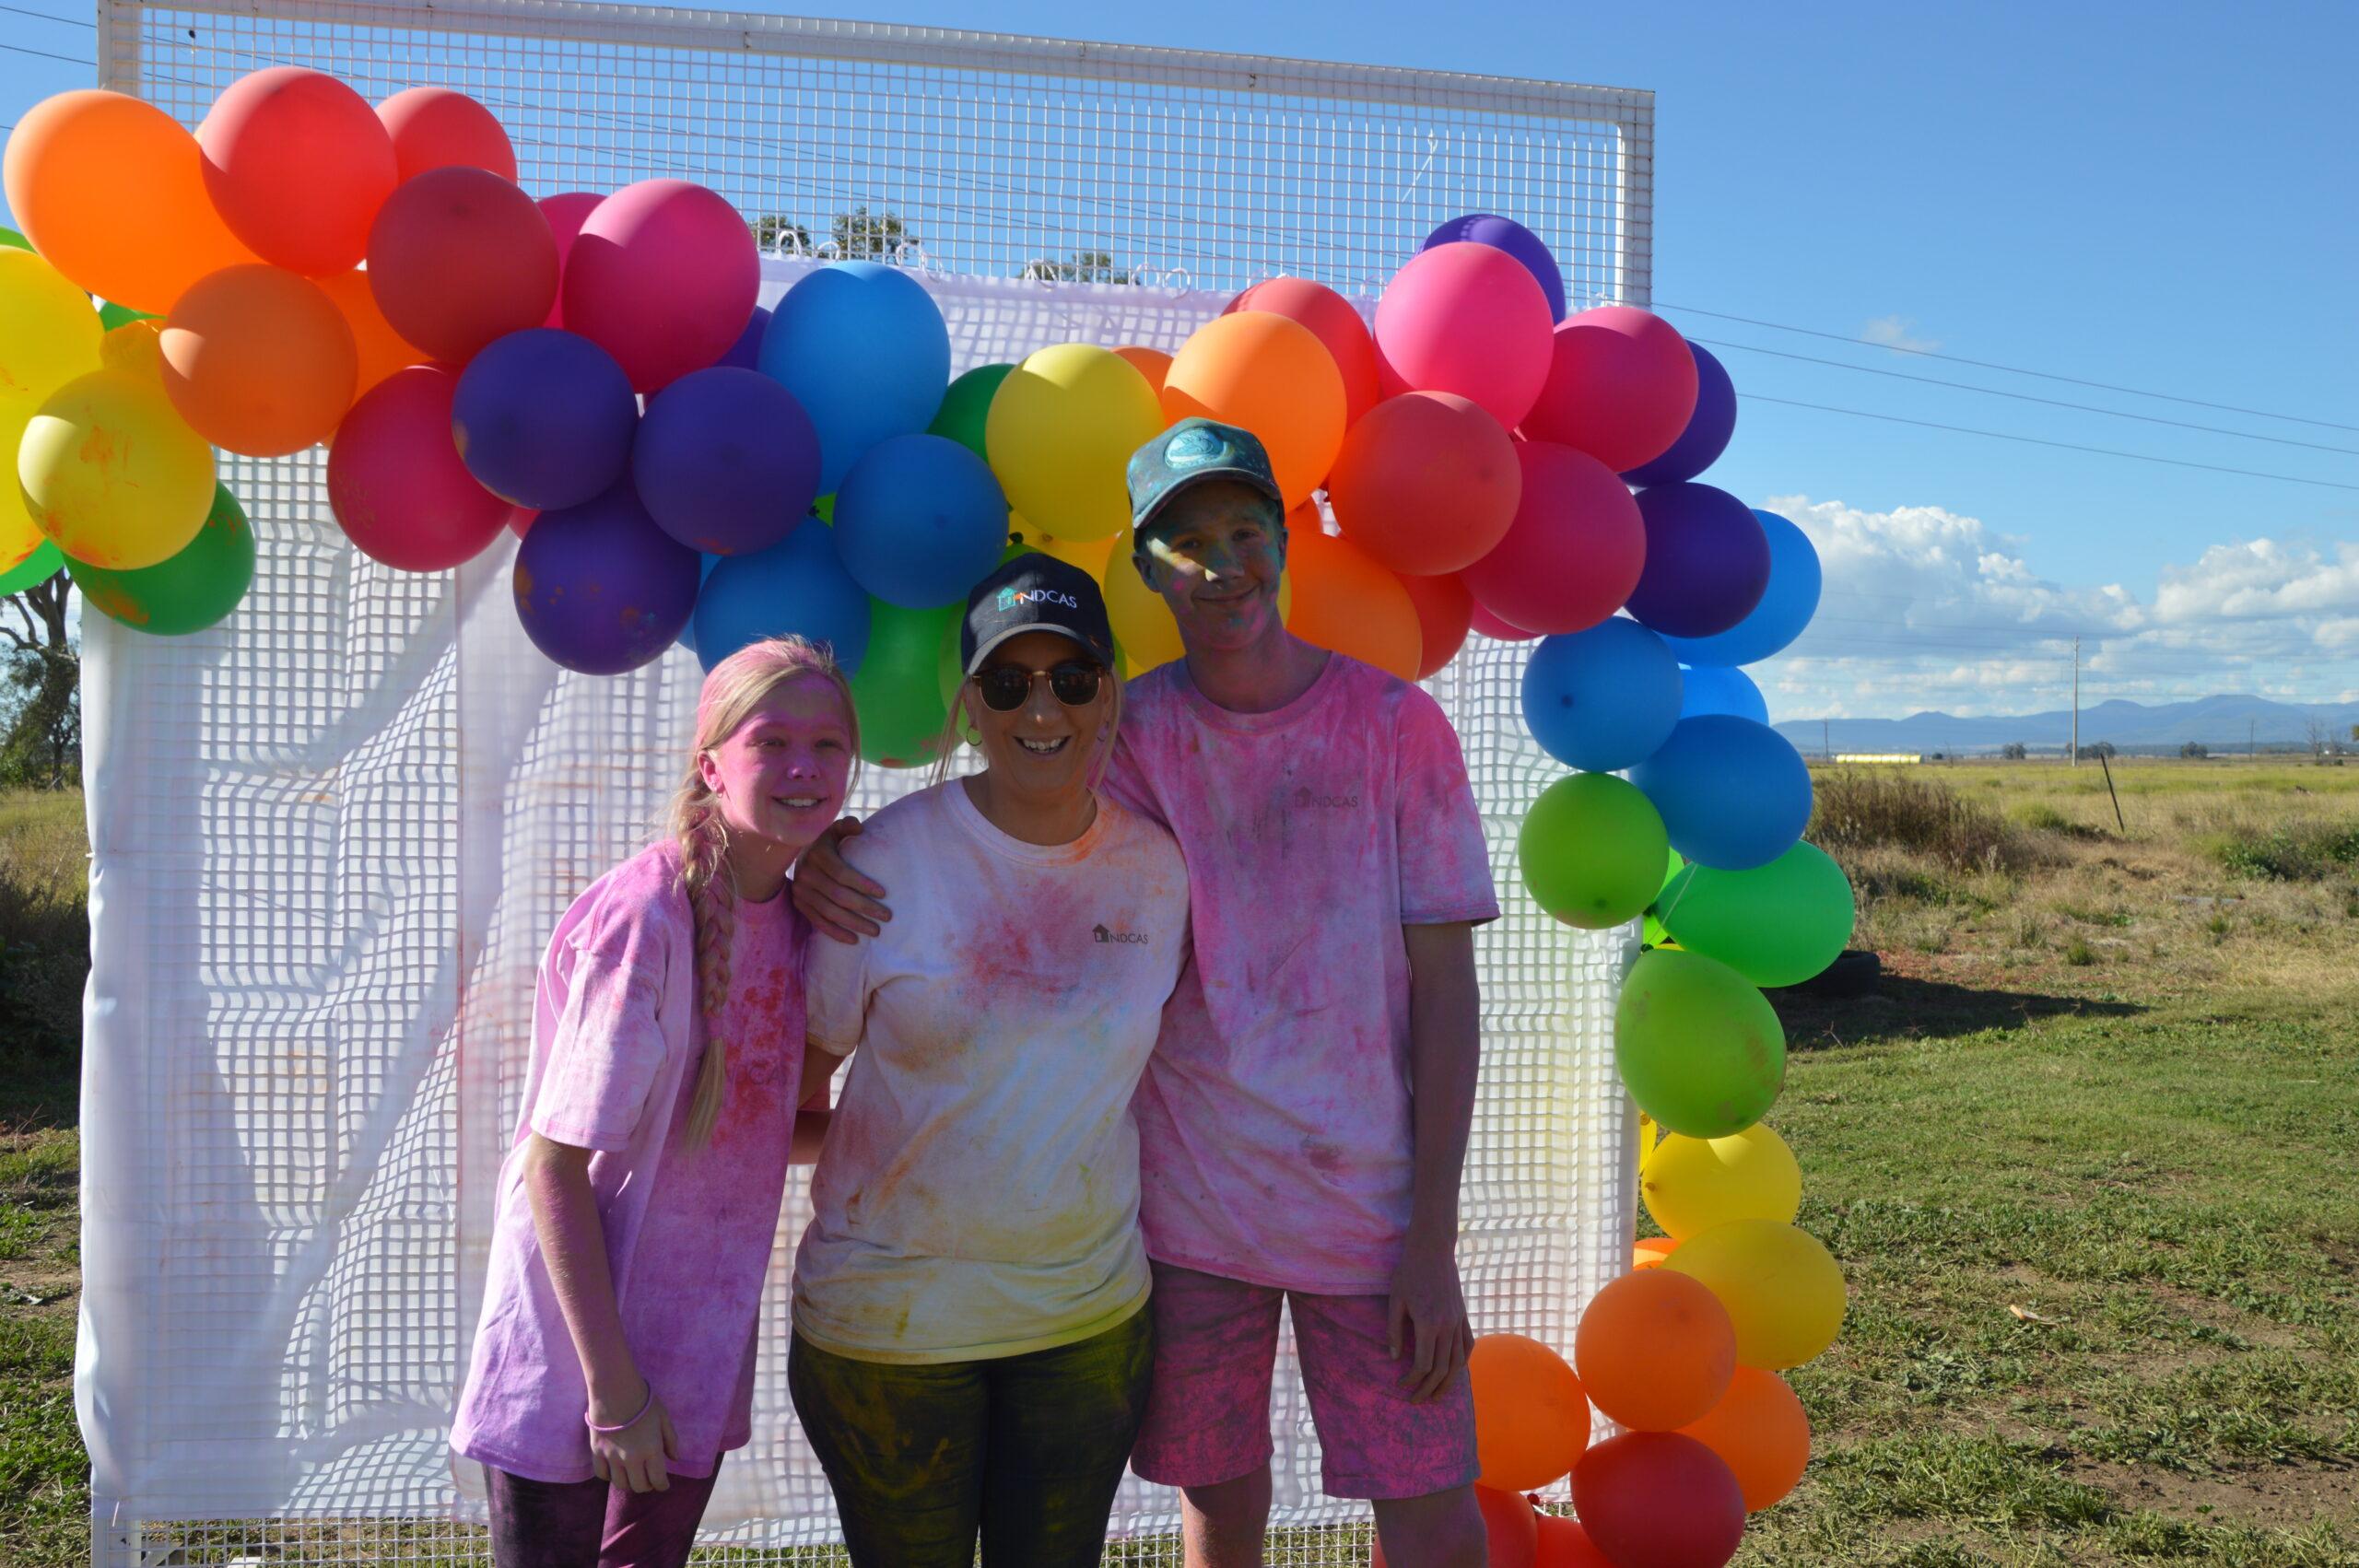 Yasmin, Renee and Lachlan Finnigan.